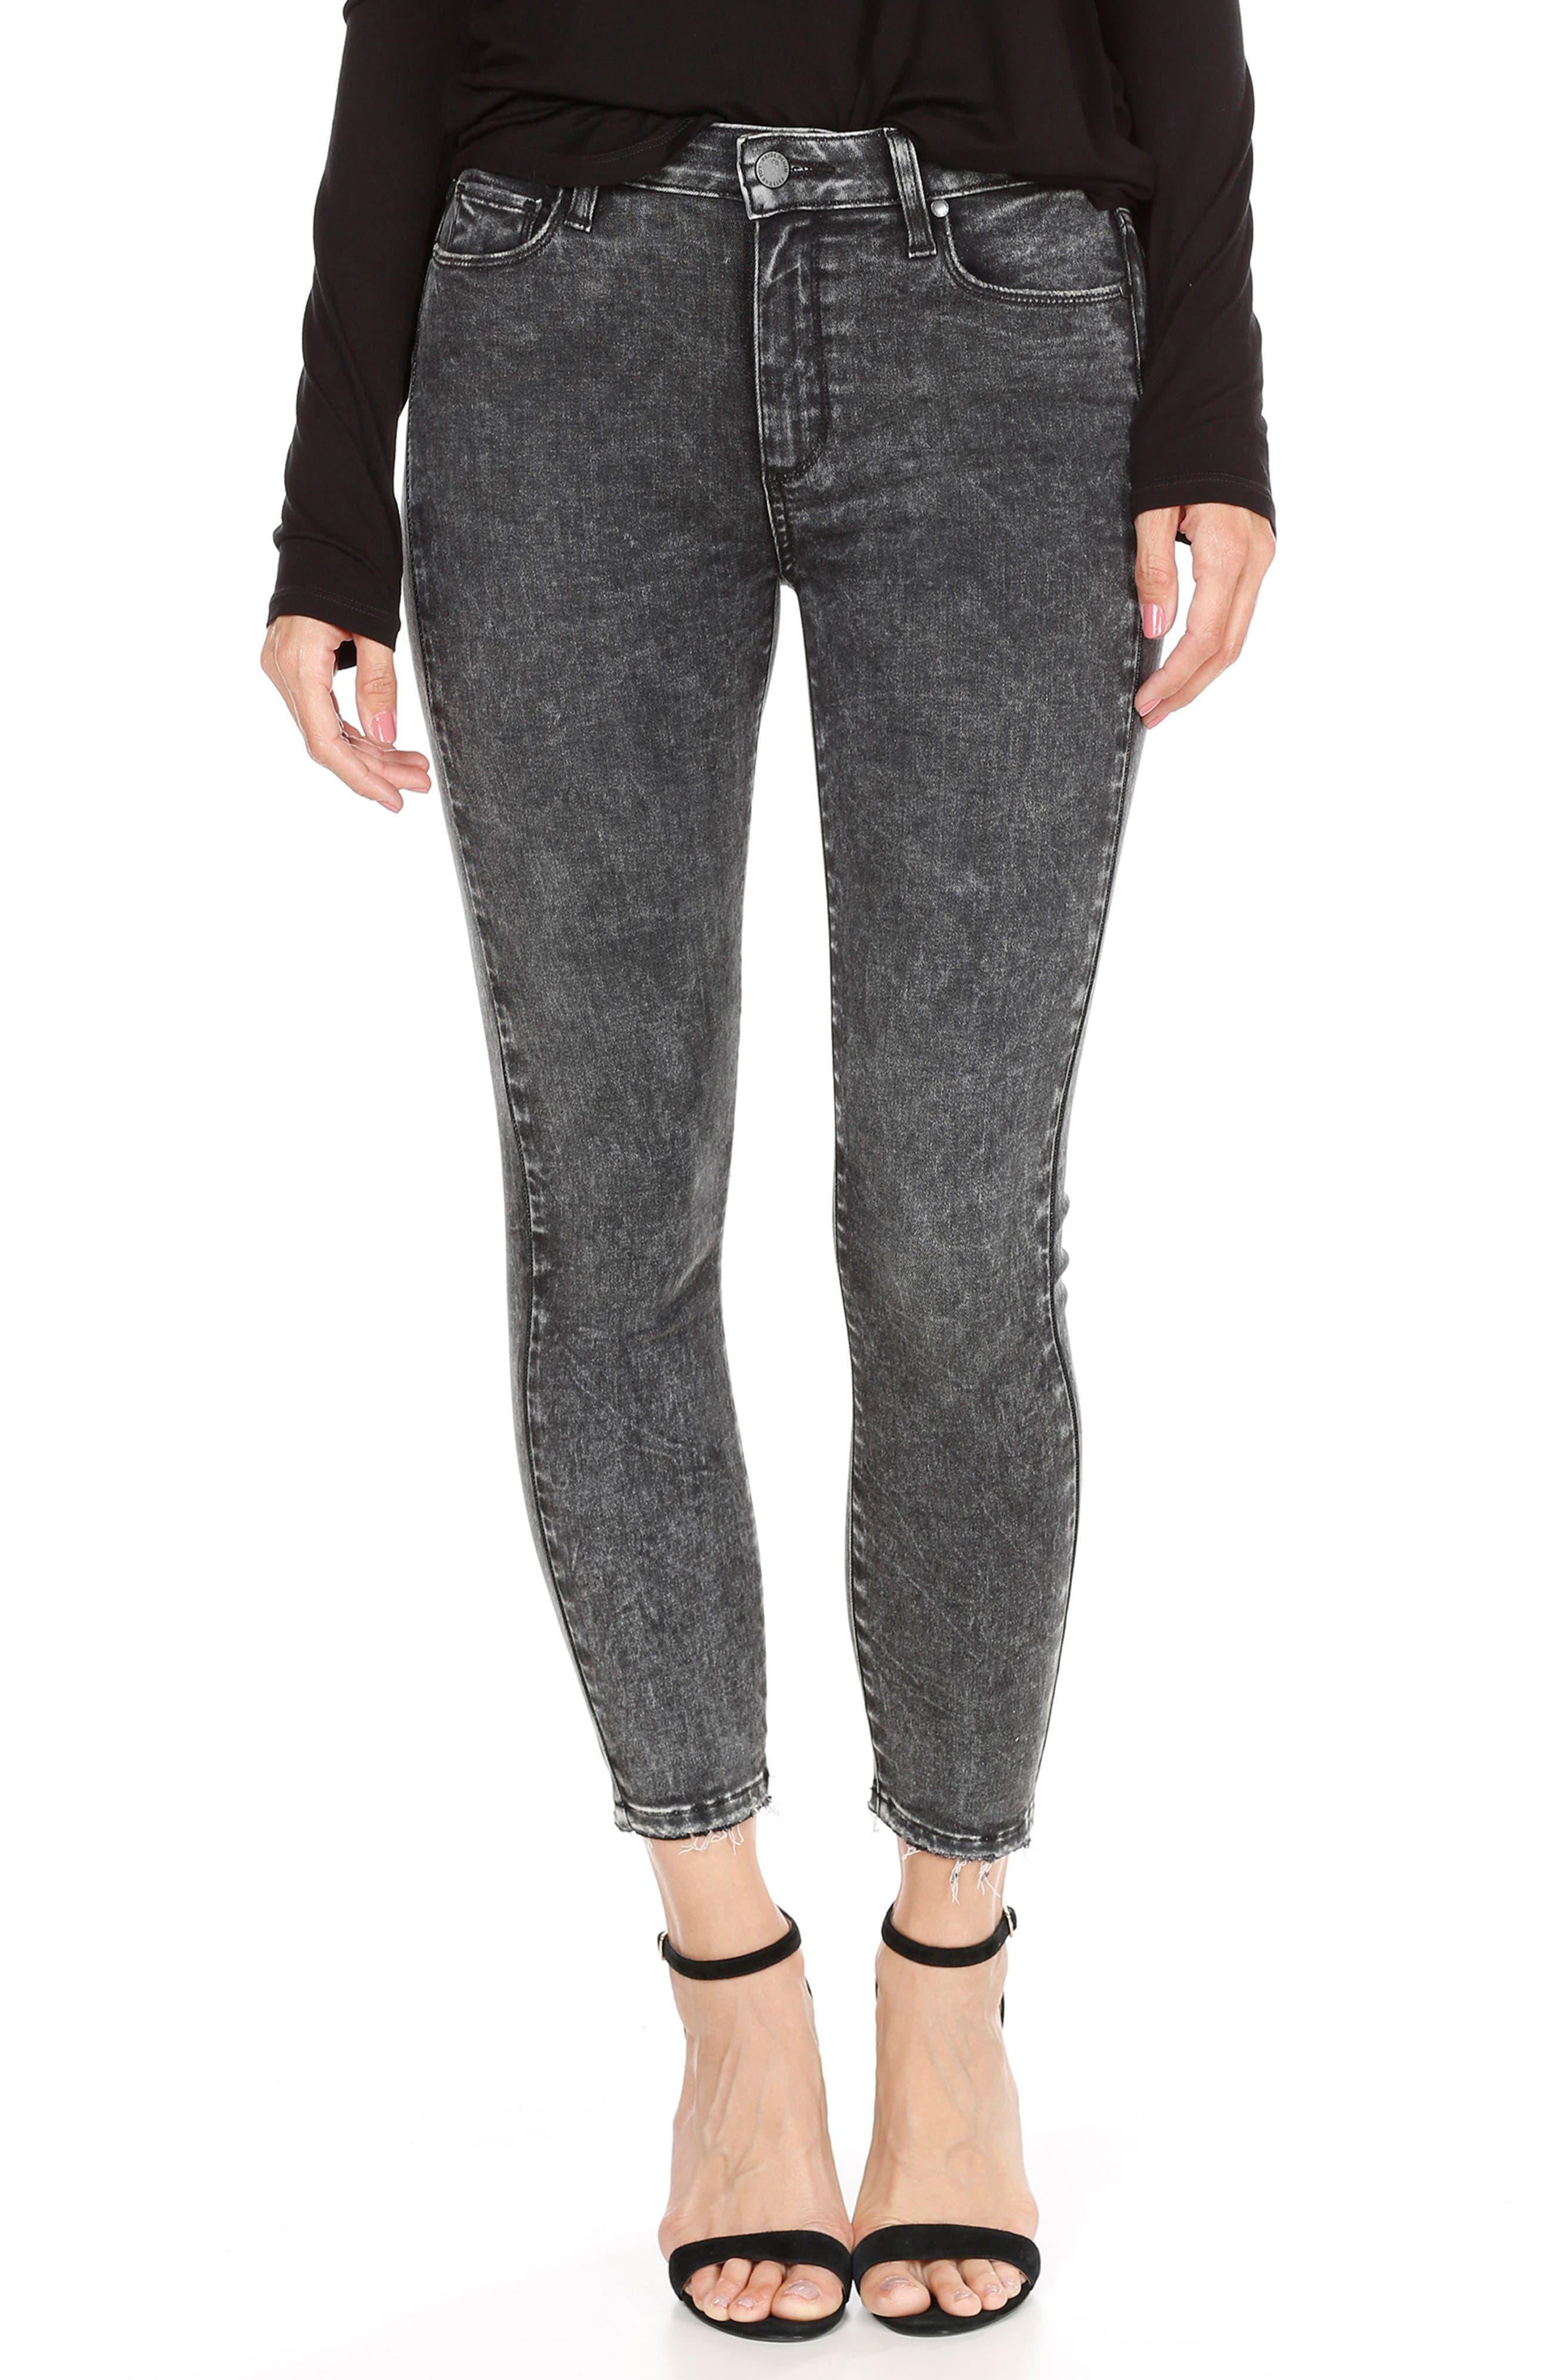 Hoxton High Waist Crop Skinny Jeans,                         Main,                         color, 021